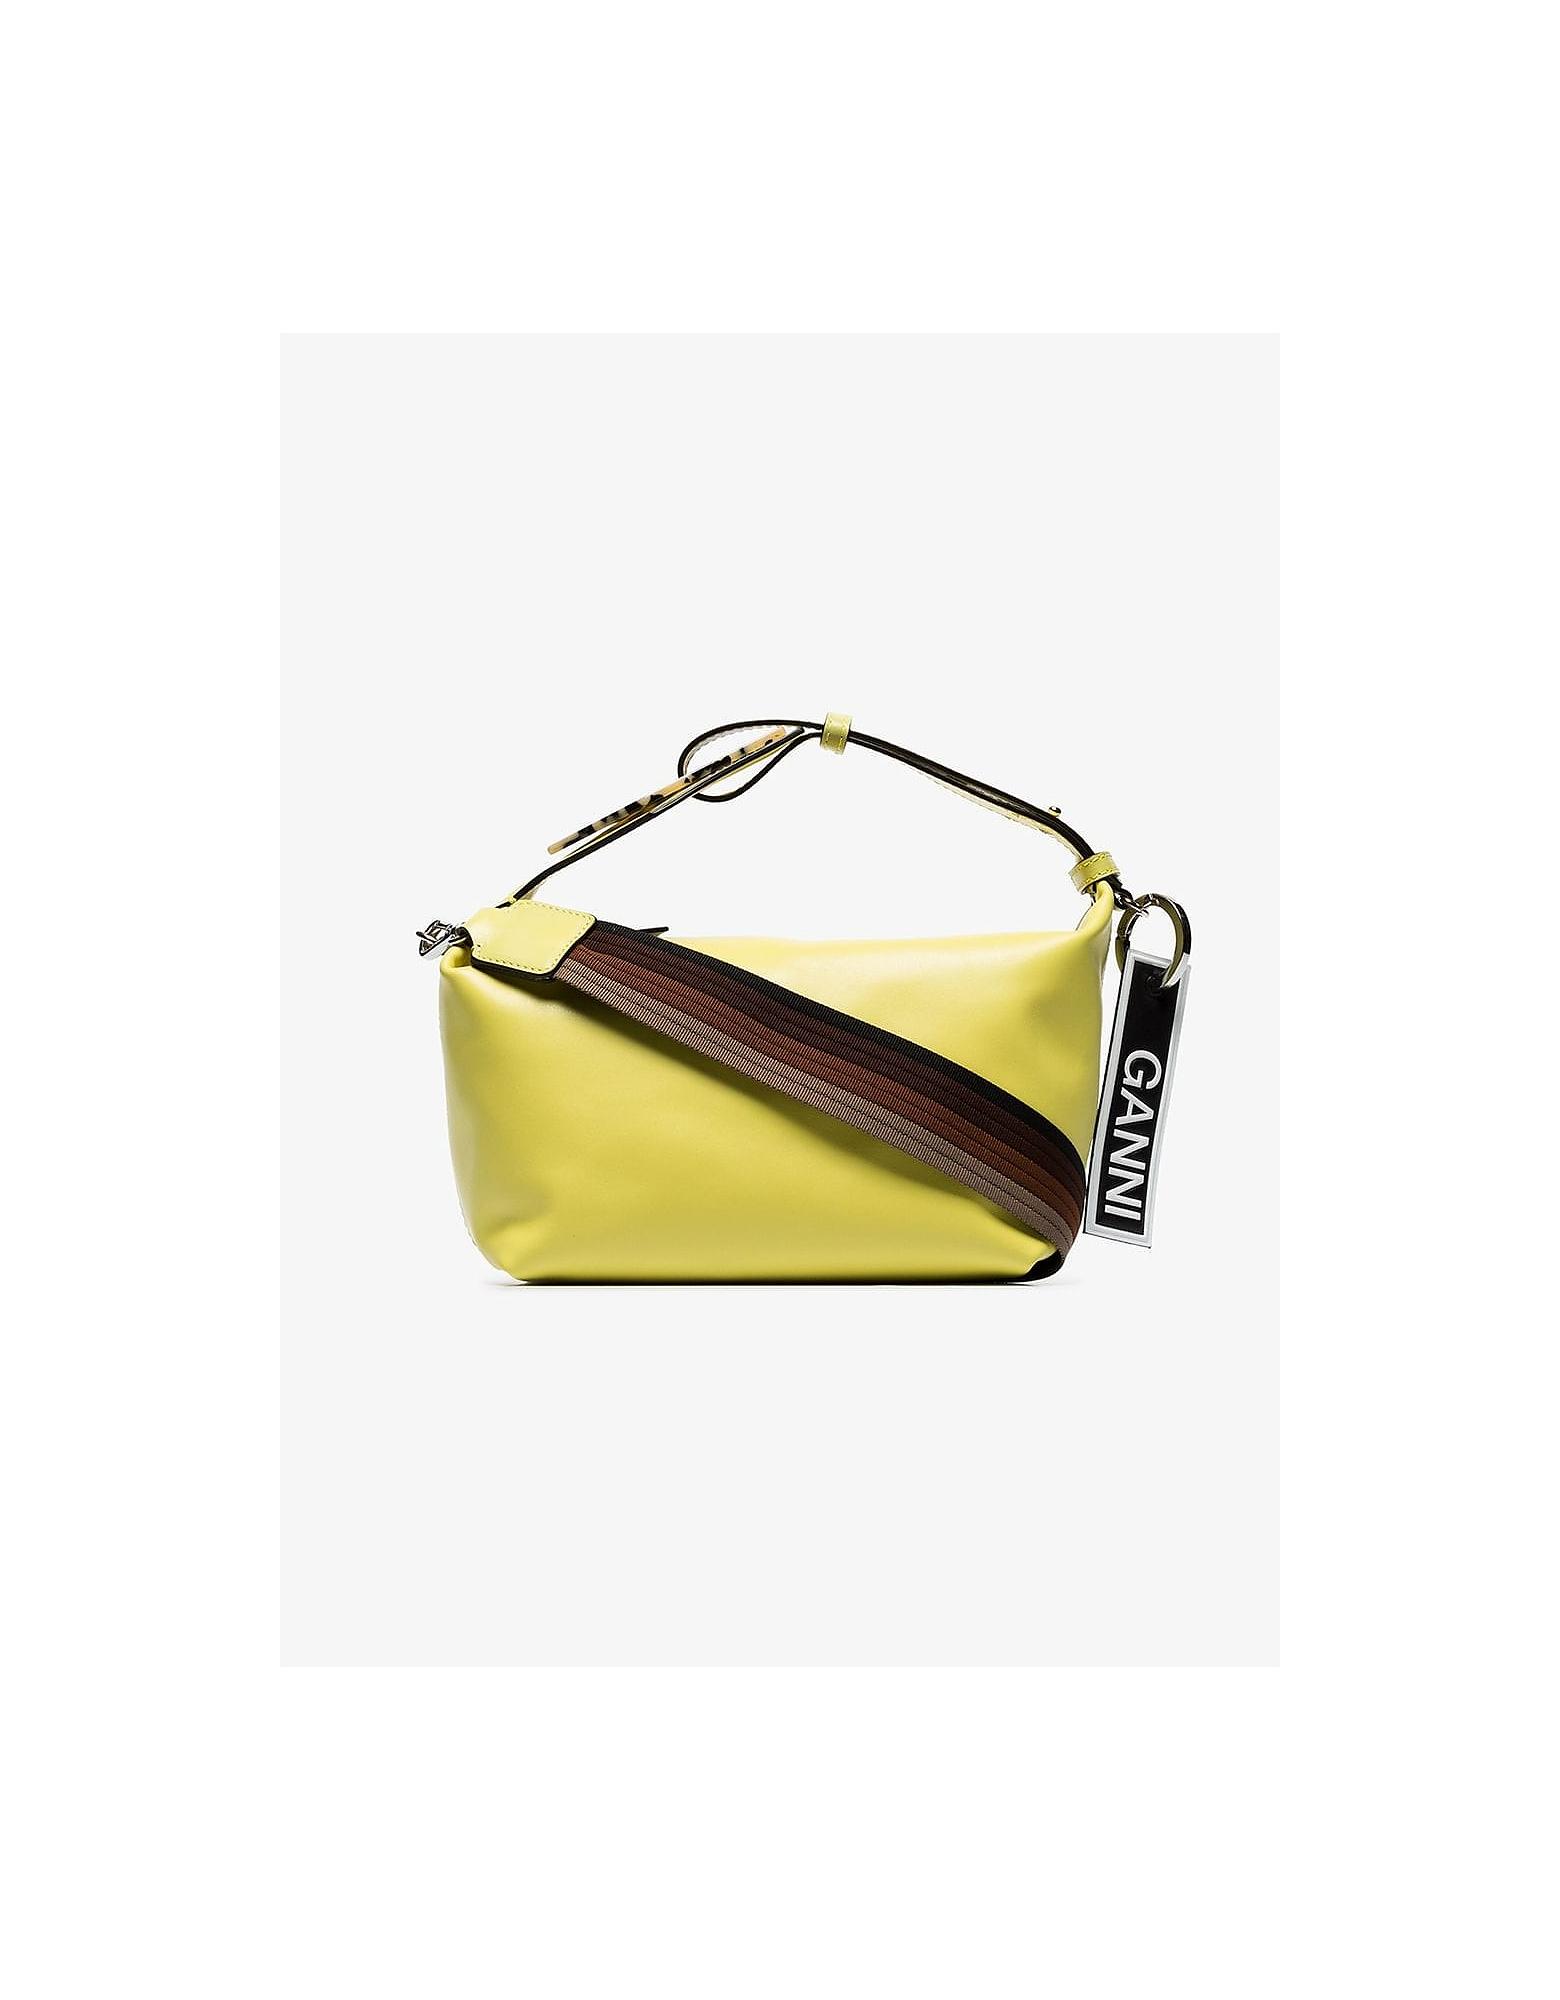 Ganni Designer Handbags, Yellow Dual Strap Leather Shoulder Bag